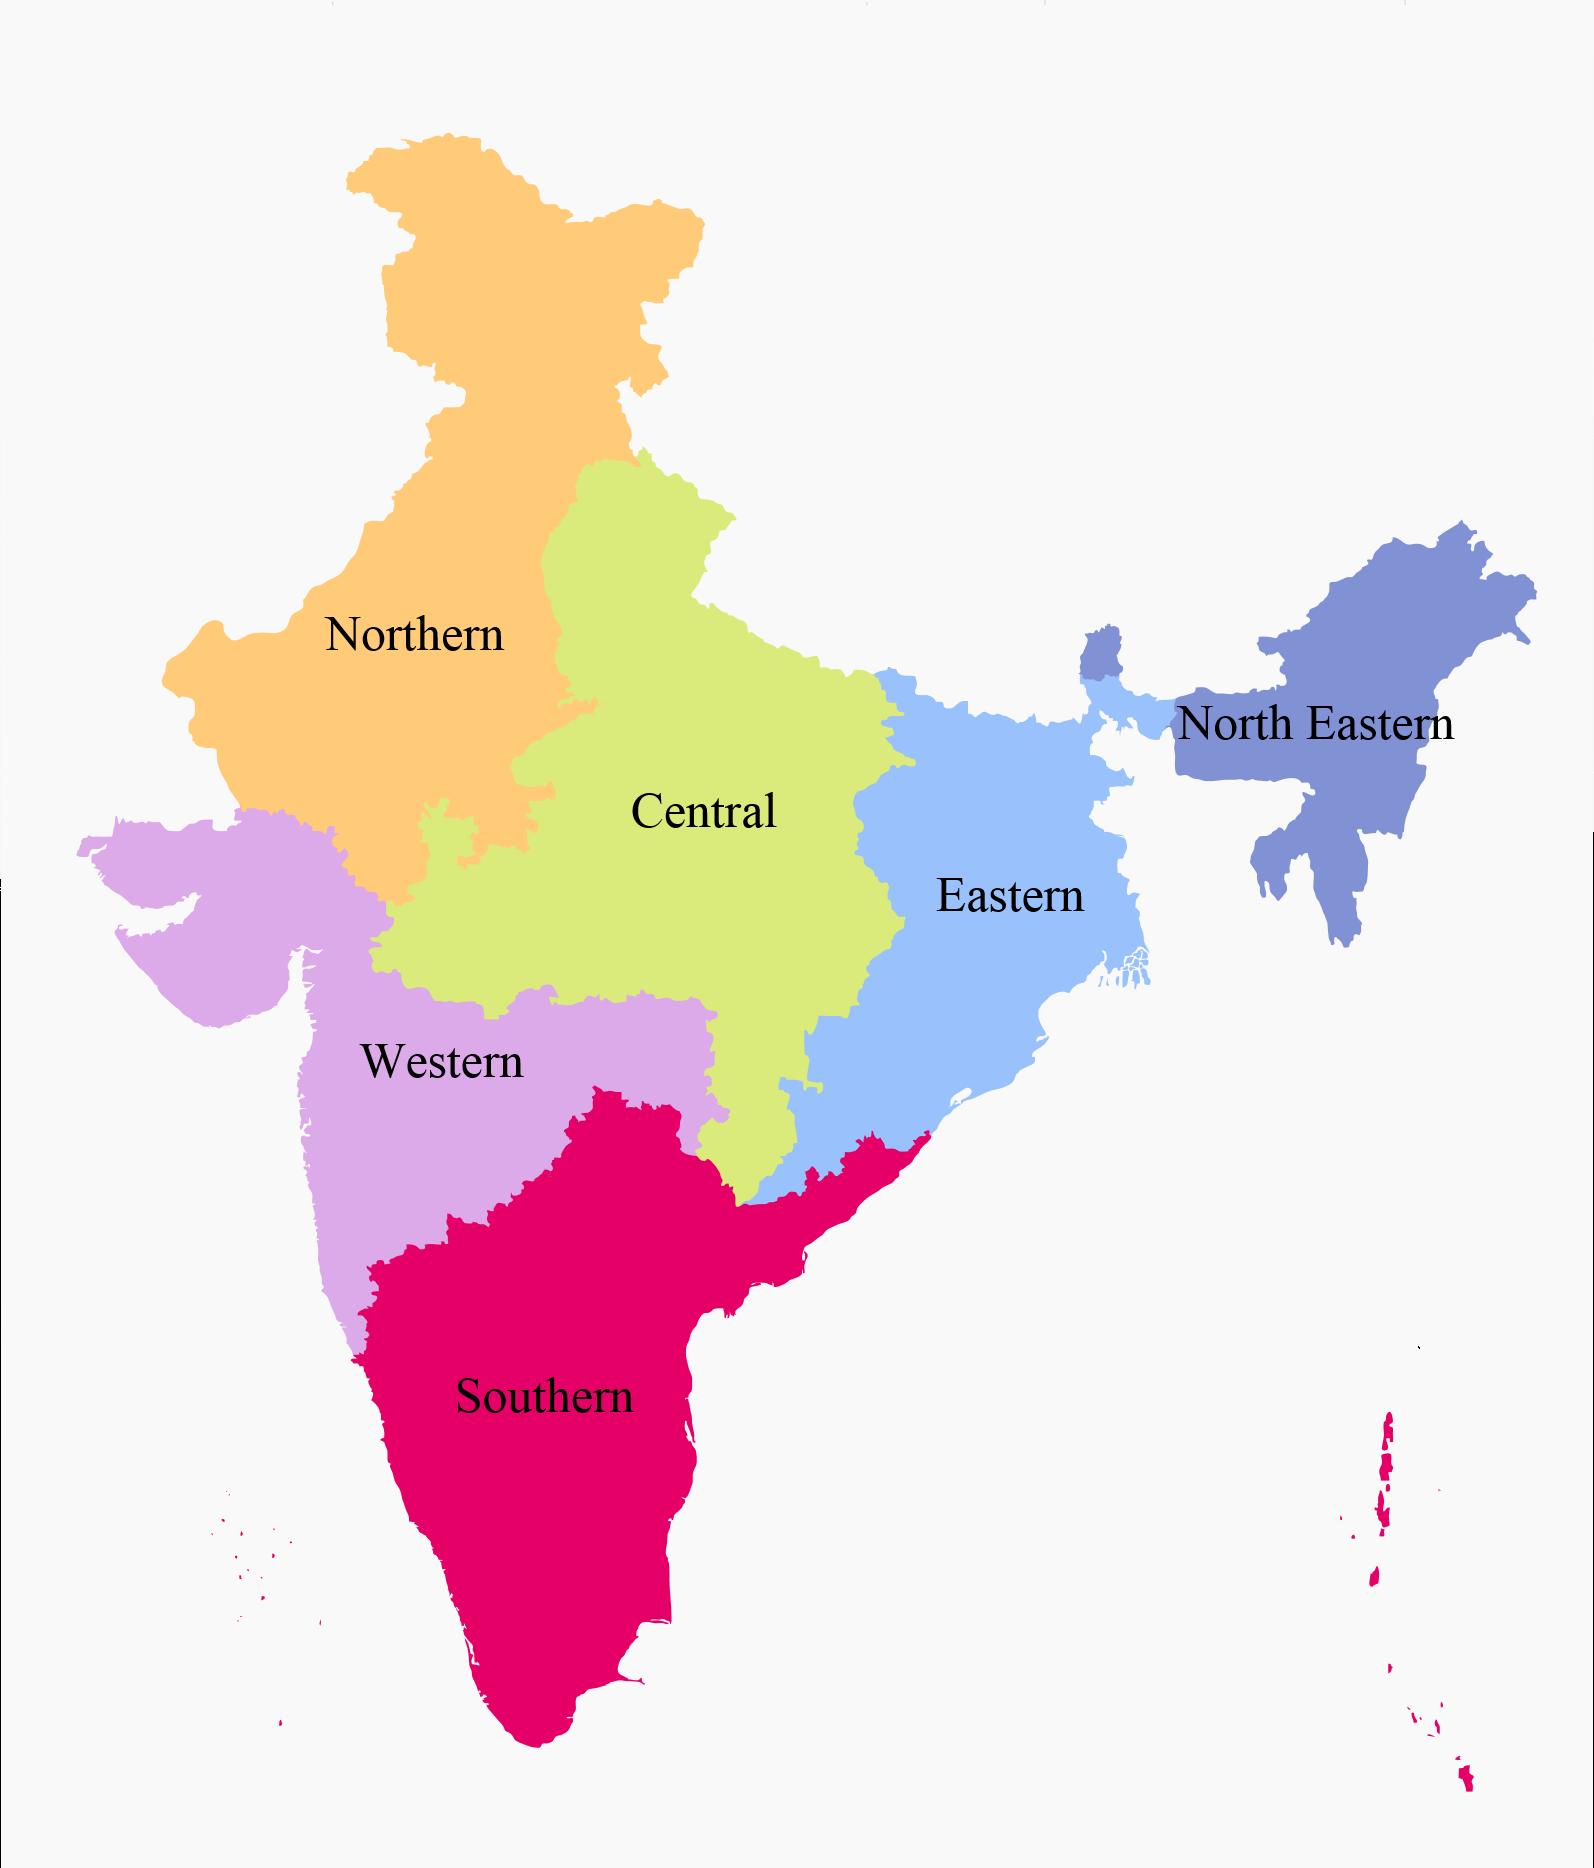 Zones and Regions